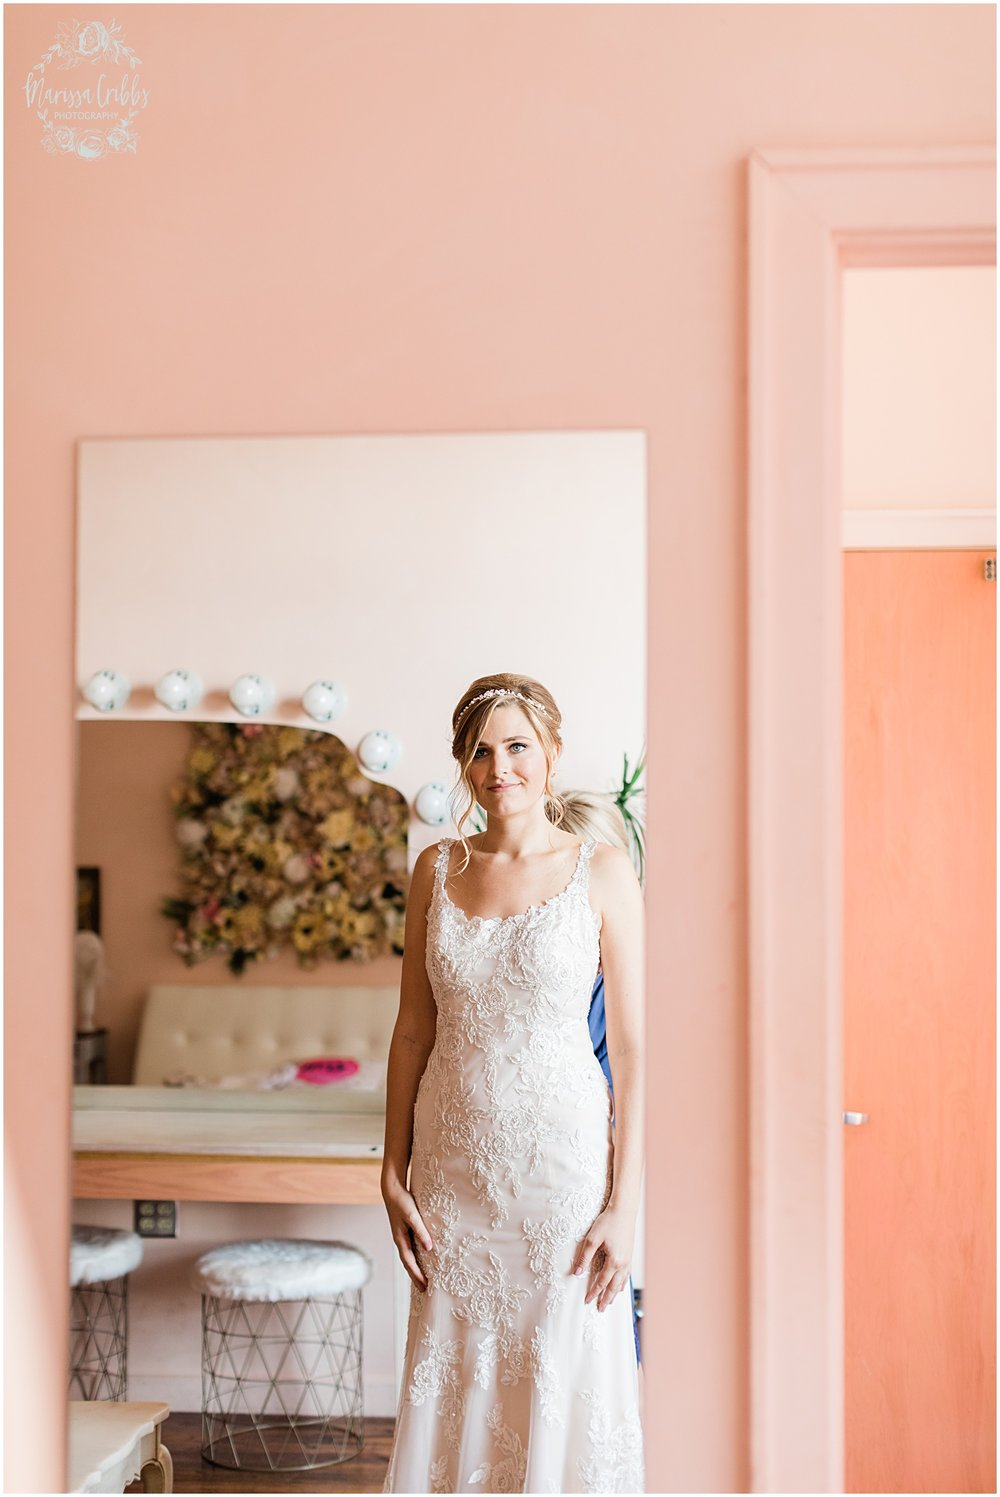 BAUER WEDDING | KELSEA & JUSTIN | MARISSA CRIBBS PHOTOGRAPHY_6495.jpg